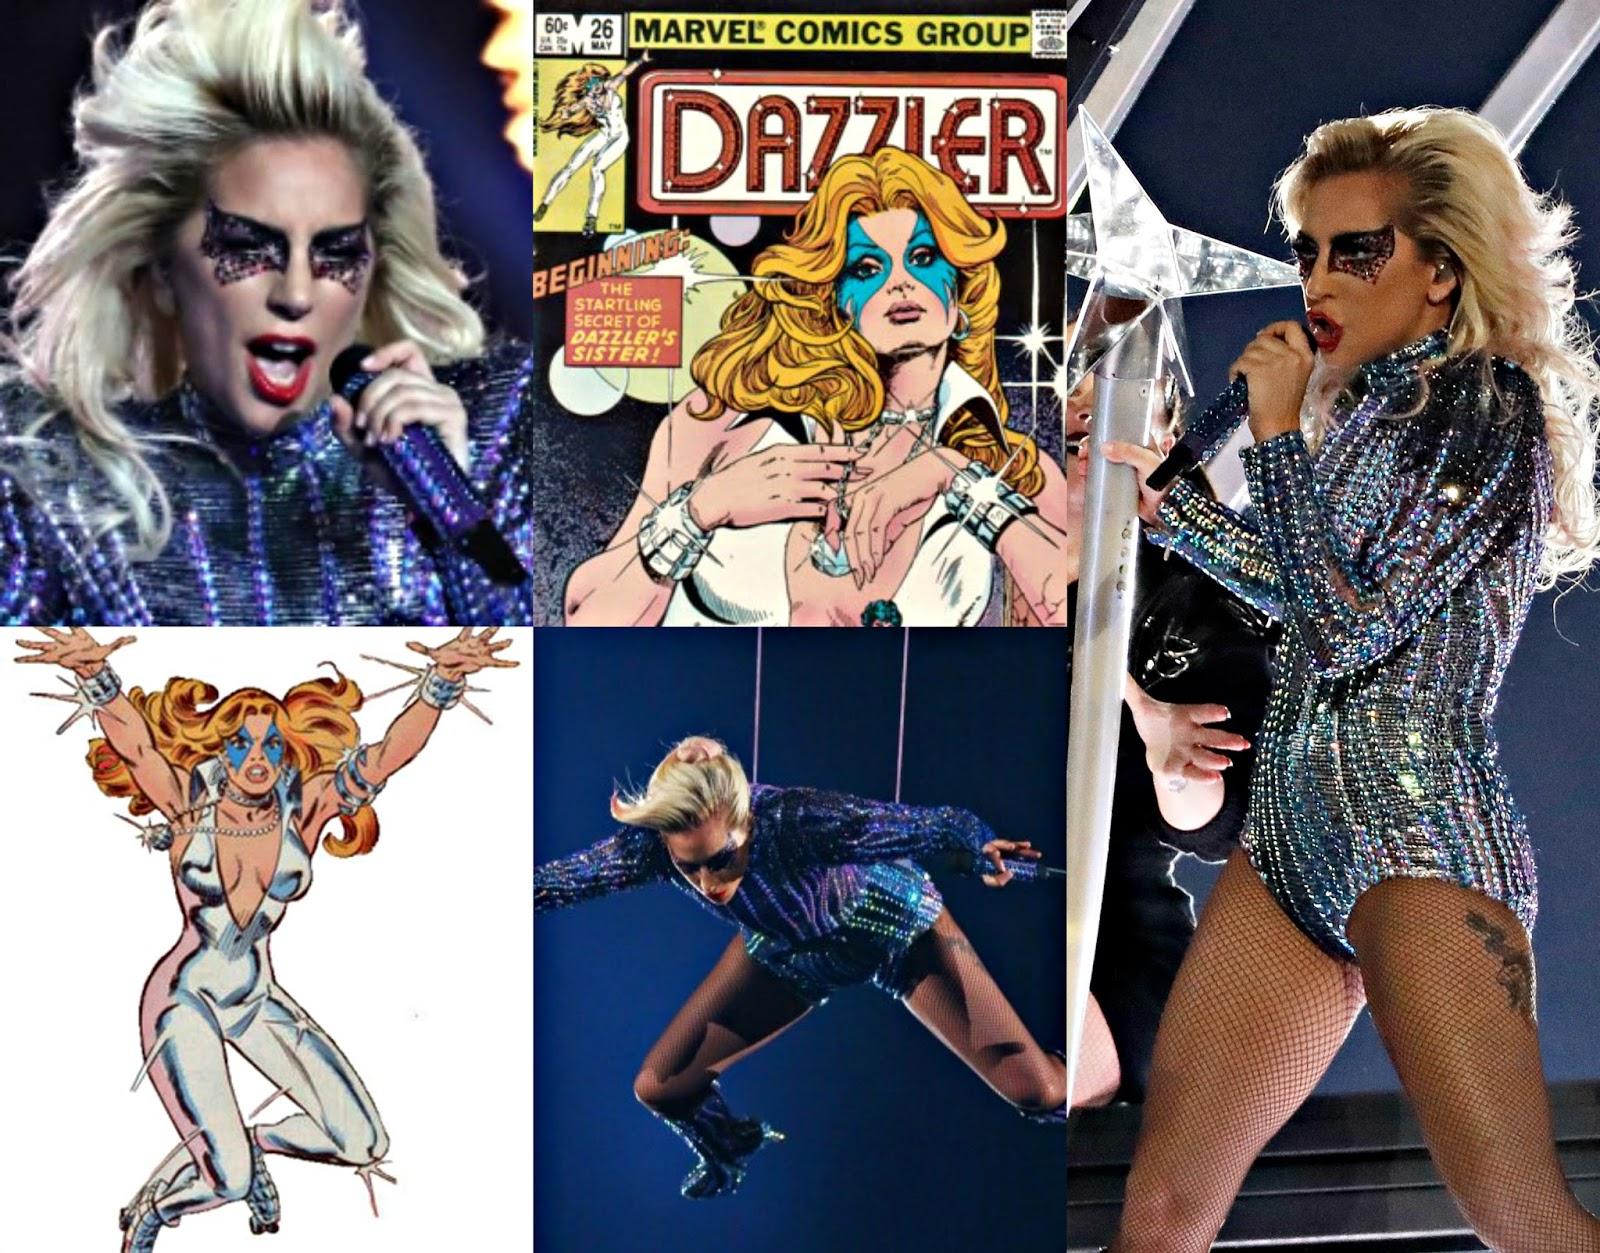 Lady-Gaga-Xmen-Dazzler-Super-Bowl.jpg